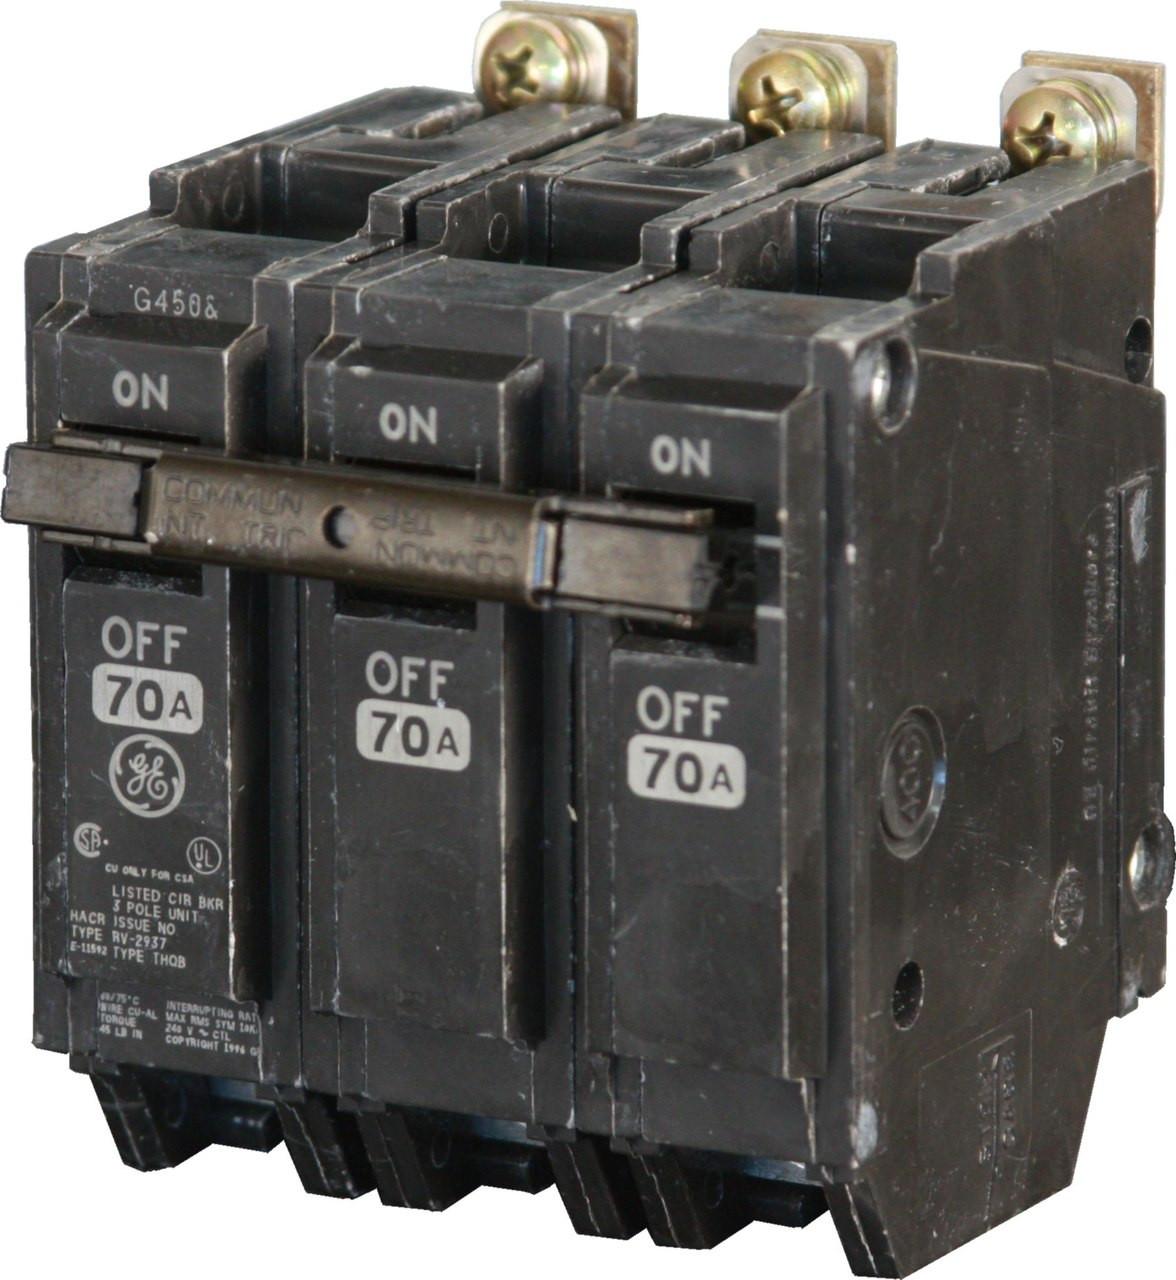 THQB32090 General Electric Panel board Bolt on lighting Circuit Breaker